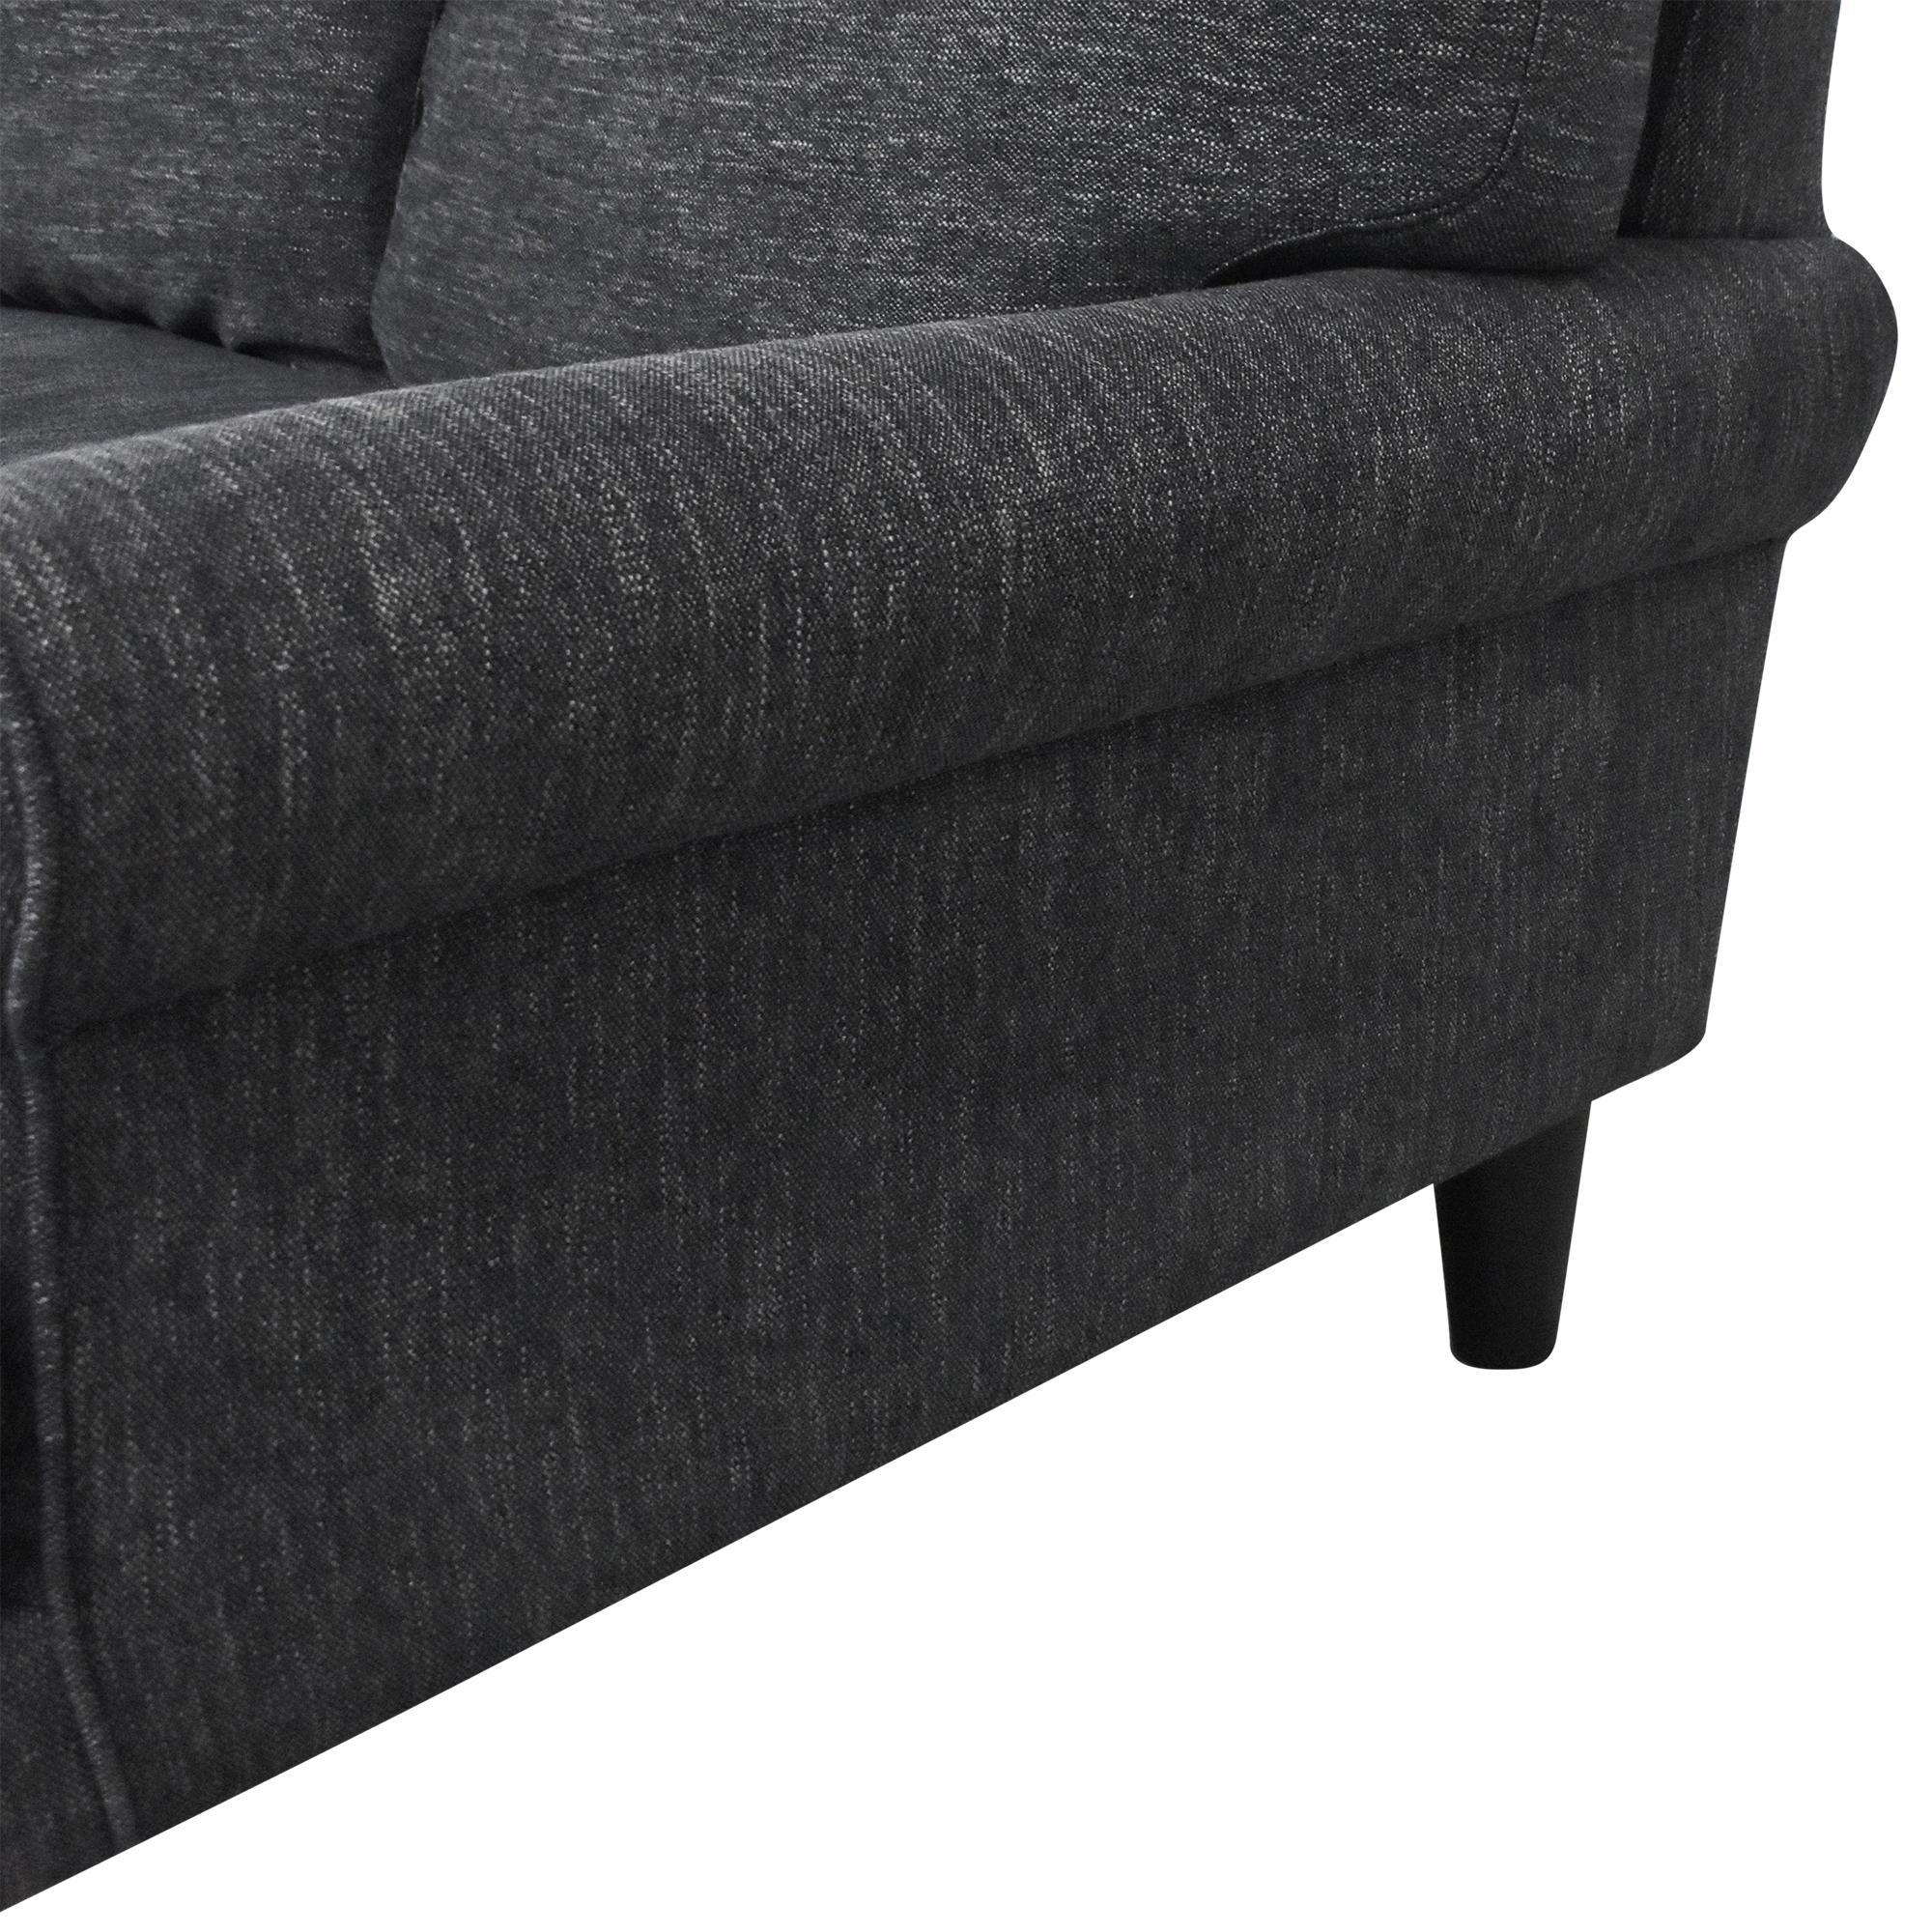 Interior Define Interior Define Maxwell Bench Cushion Sofa used